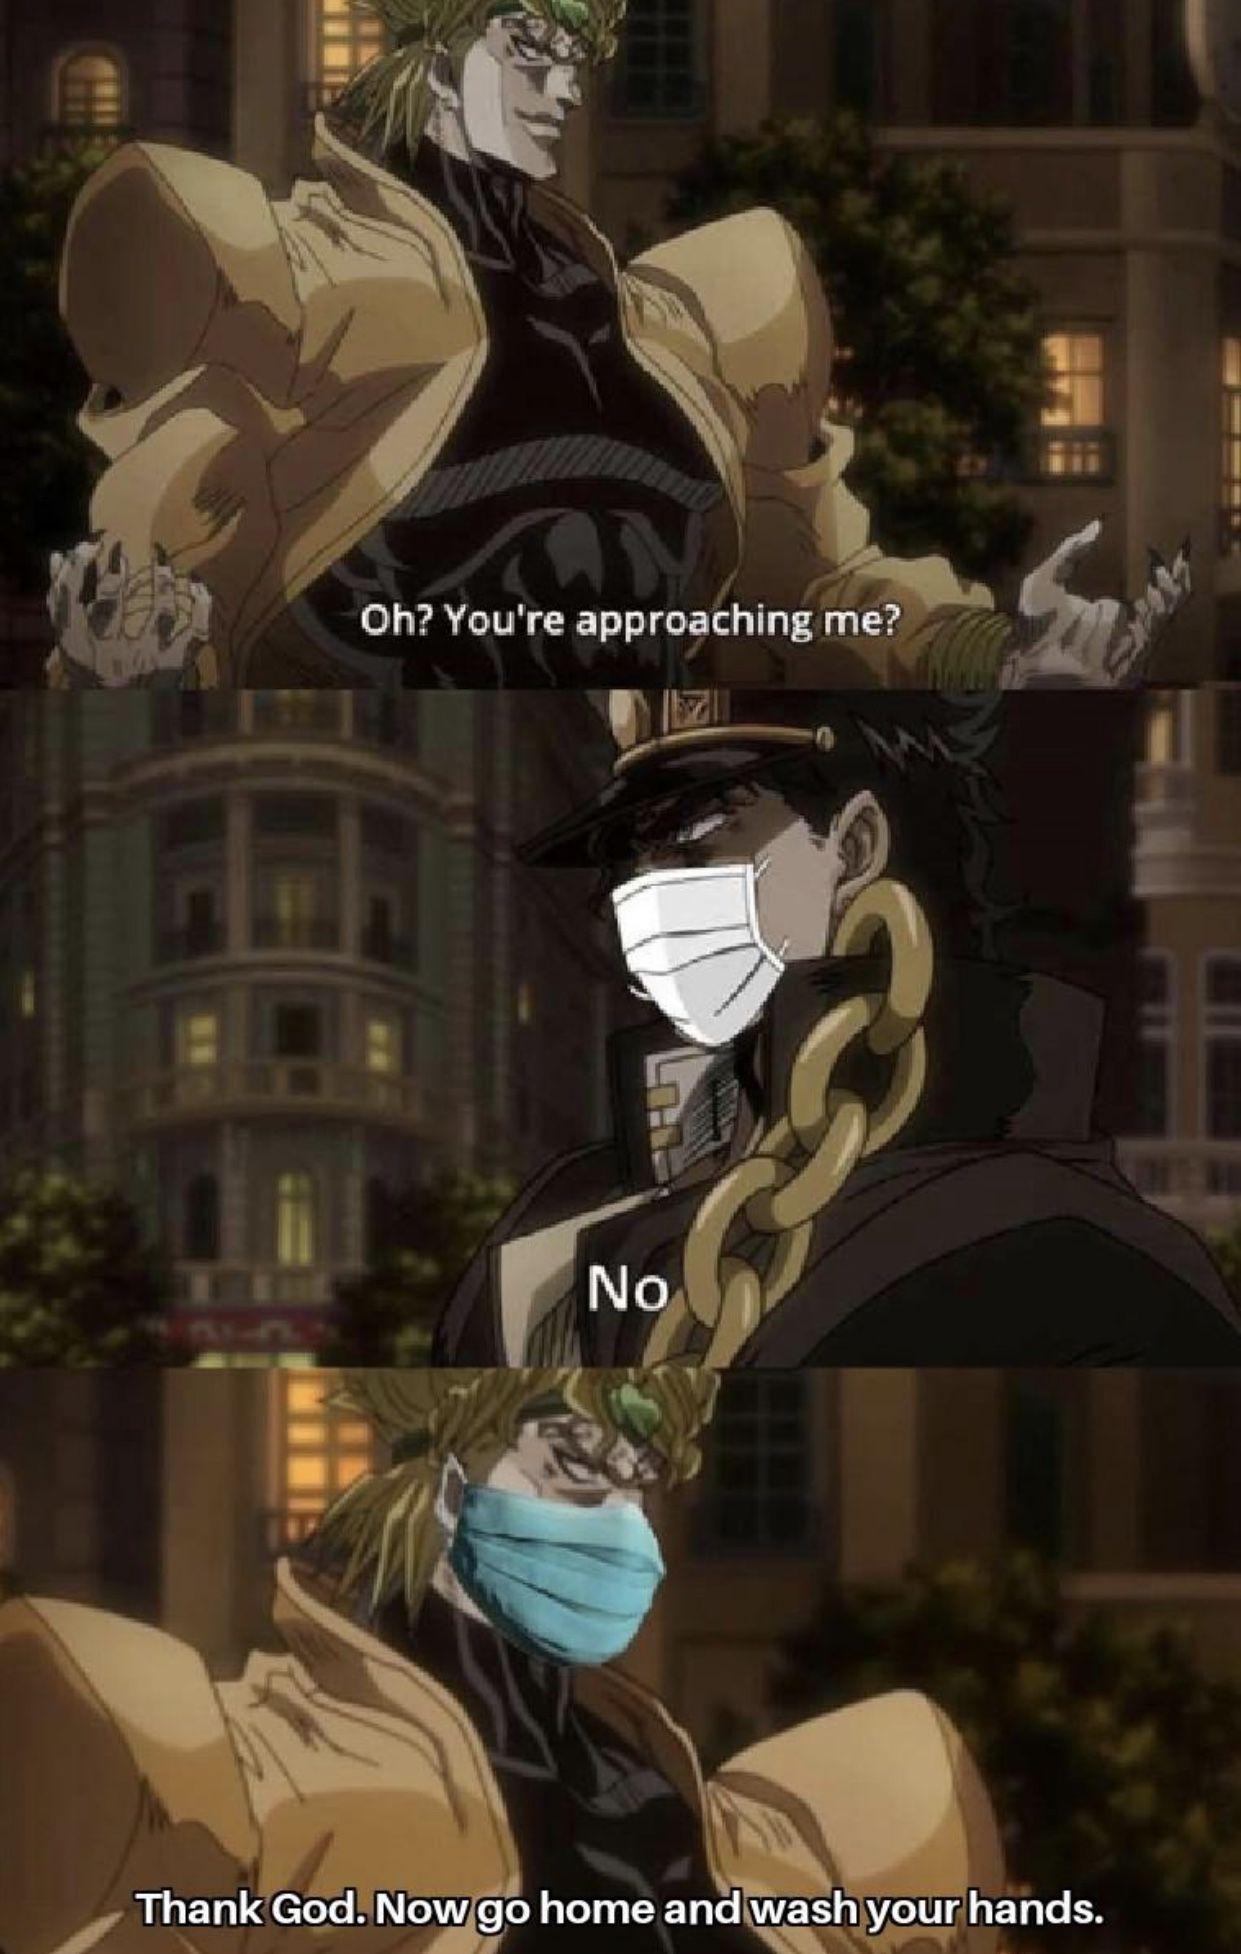 Pin by Logan on Geek in 2020 Anime memes funny, Jojo